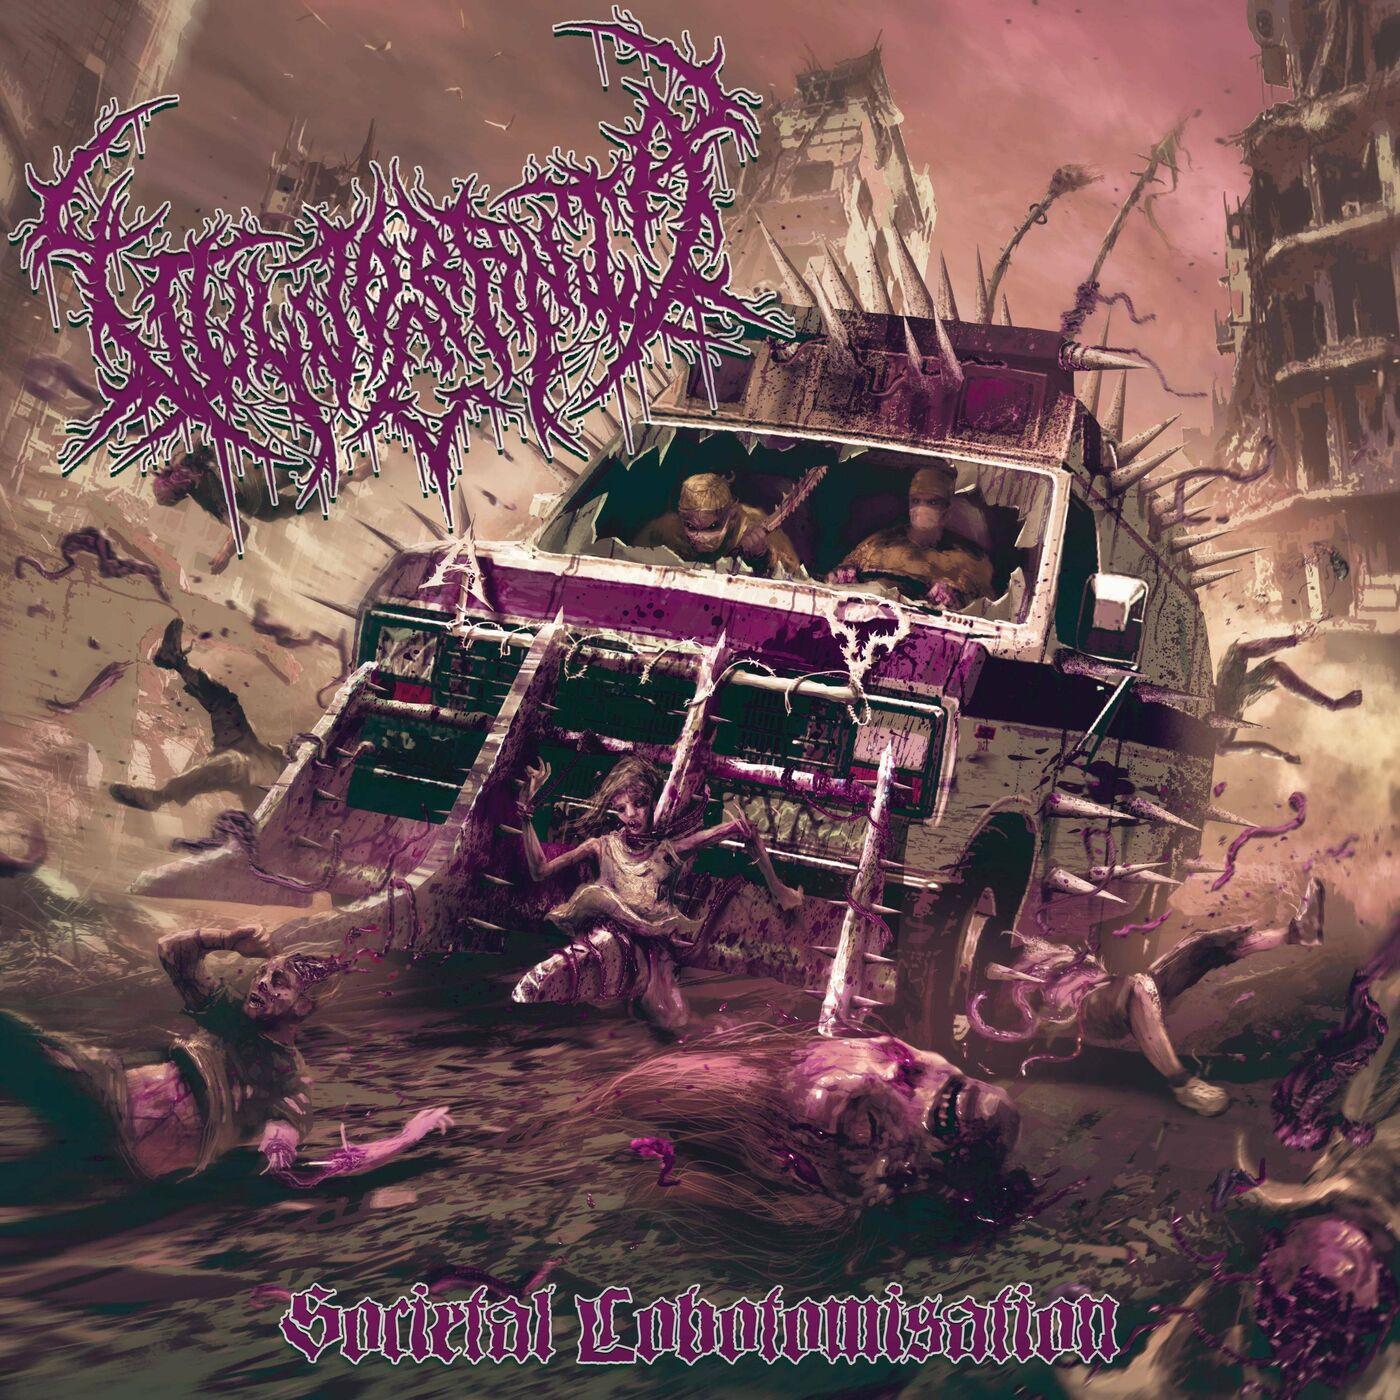 Vulvocrania - Societal Lobotomisation [split EP] (2021)